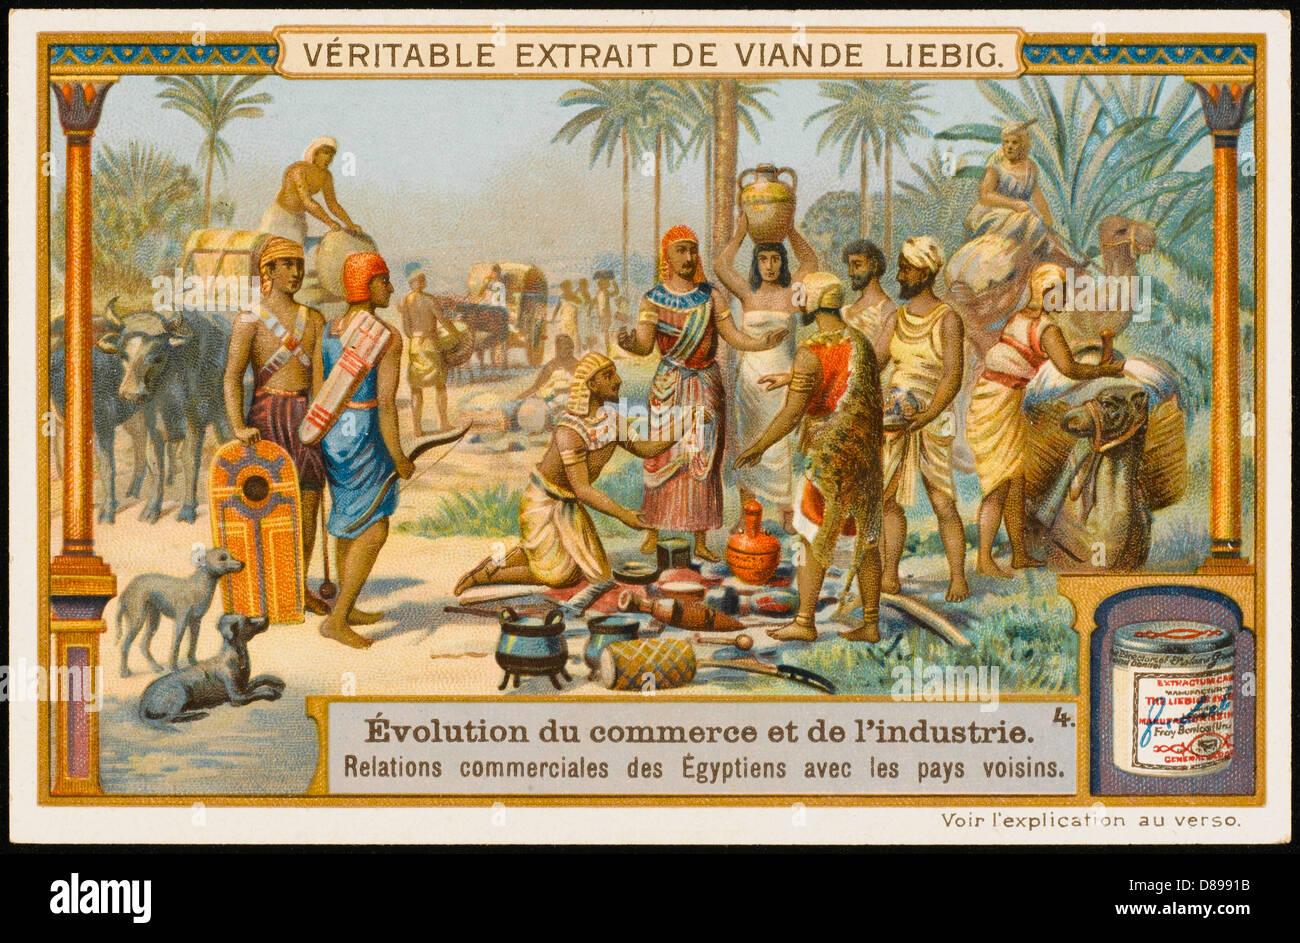 Trade Ancient Egypt Stock Photo, Royalty Free Image: 56753015 - Alamy